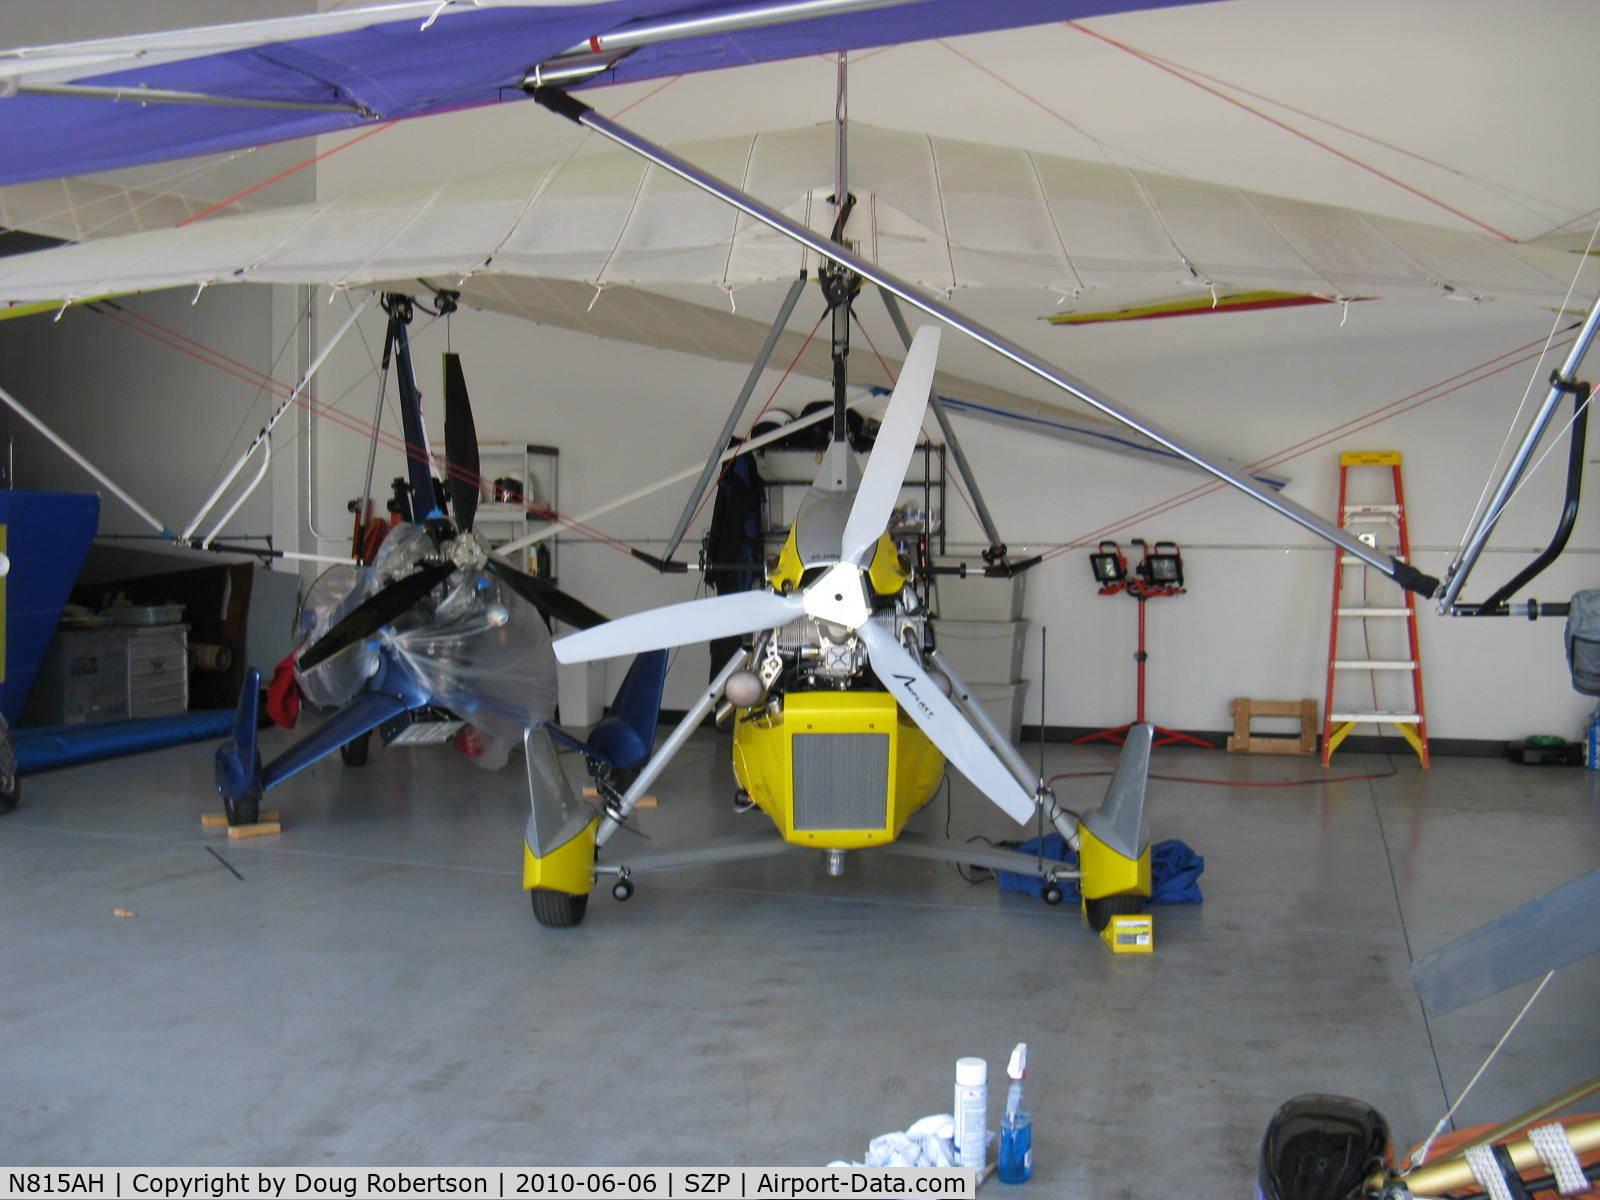 N815AH, 2006 Air Creation Tanarg C/N T06076, 2006 Air Creation USA TANARG, Rotax 912ULS 80 Hp pusher,  weight-shift control Experimental Light Sport Aircraft, three-blade pusher prop